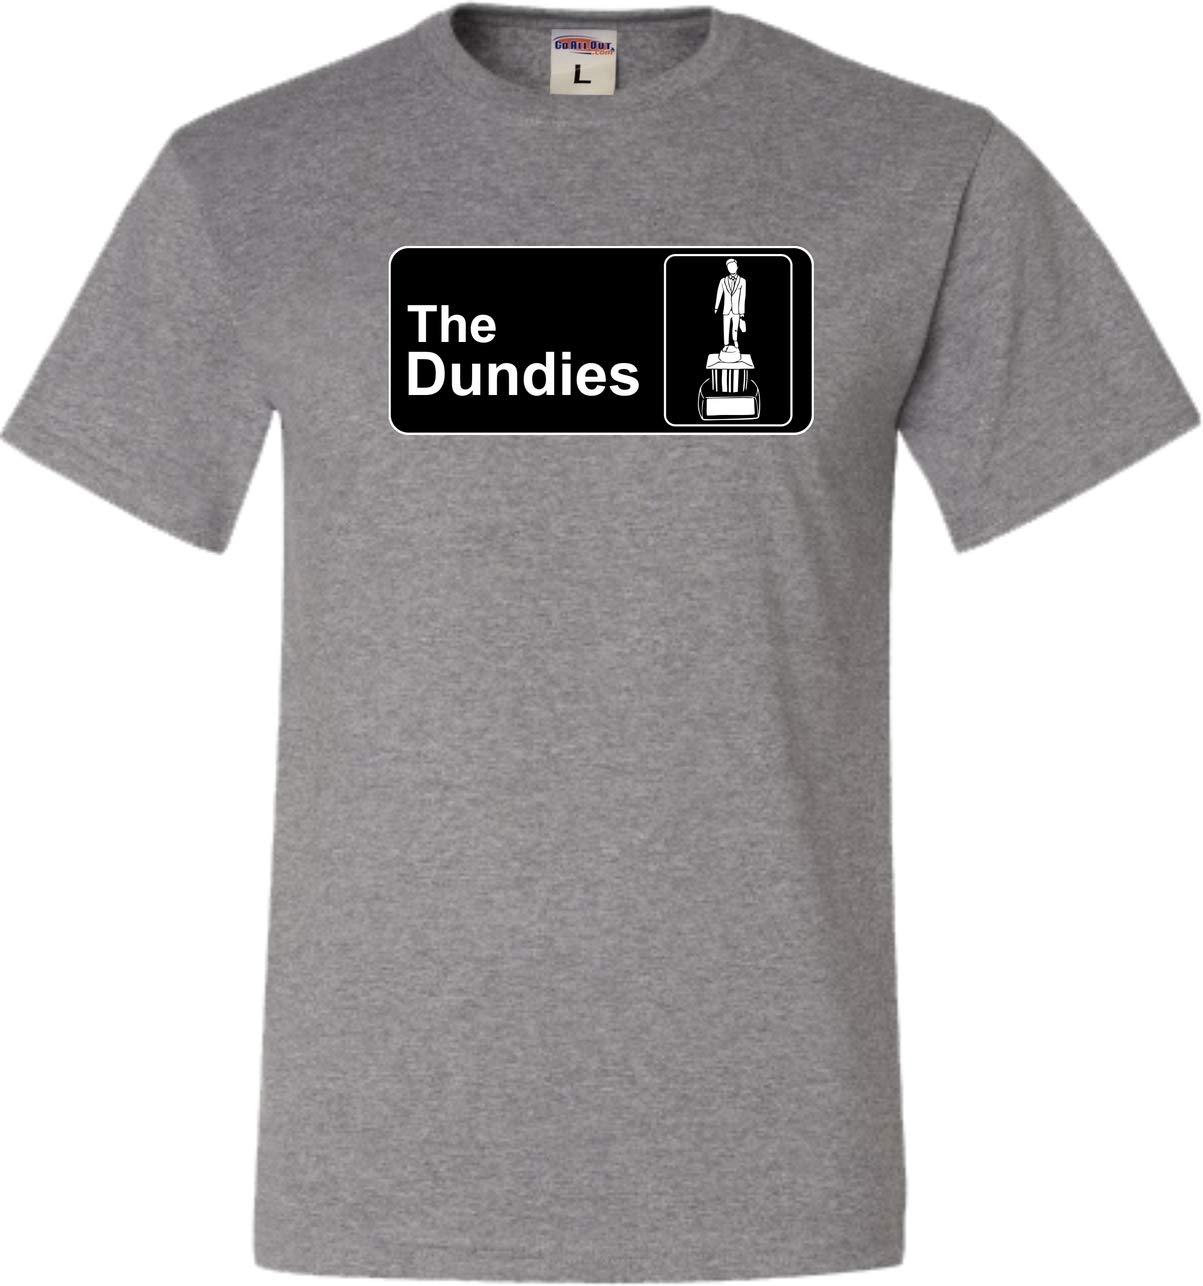 Adult The Dundies Tshirt